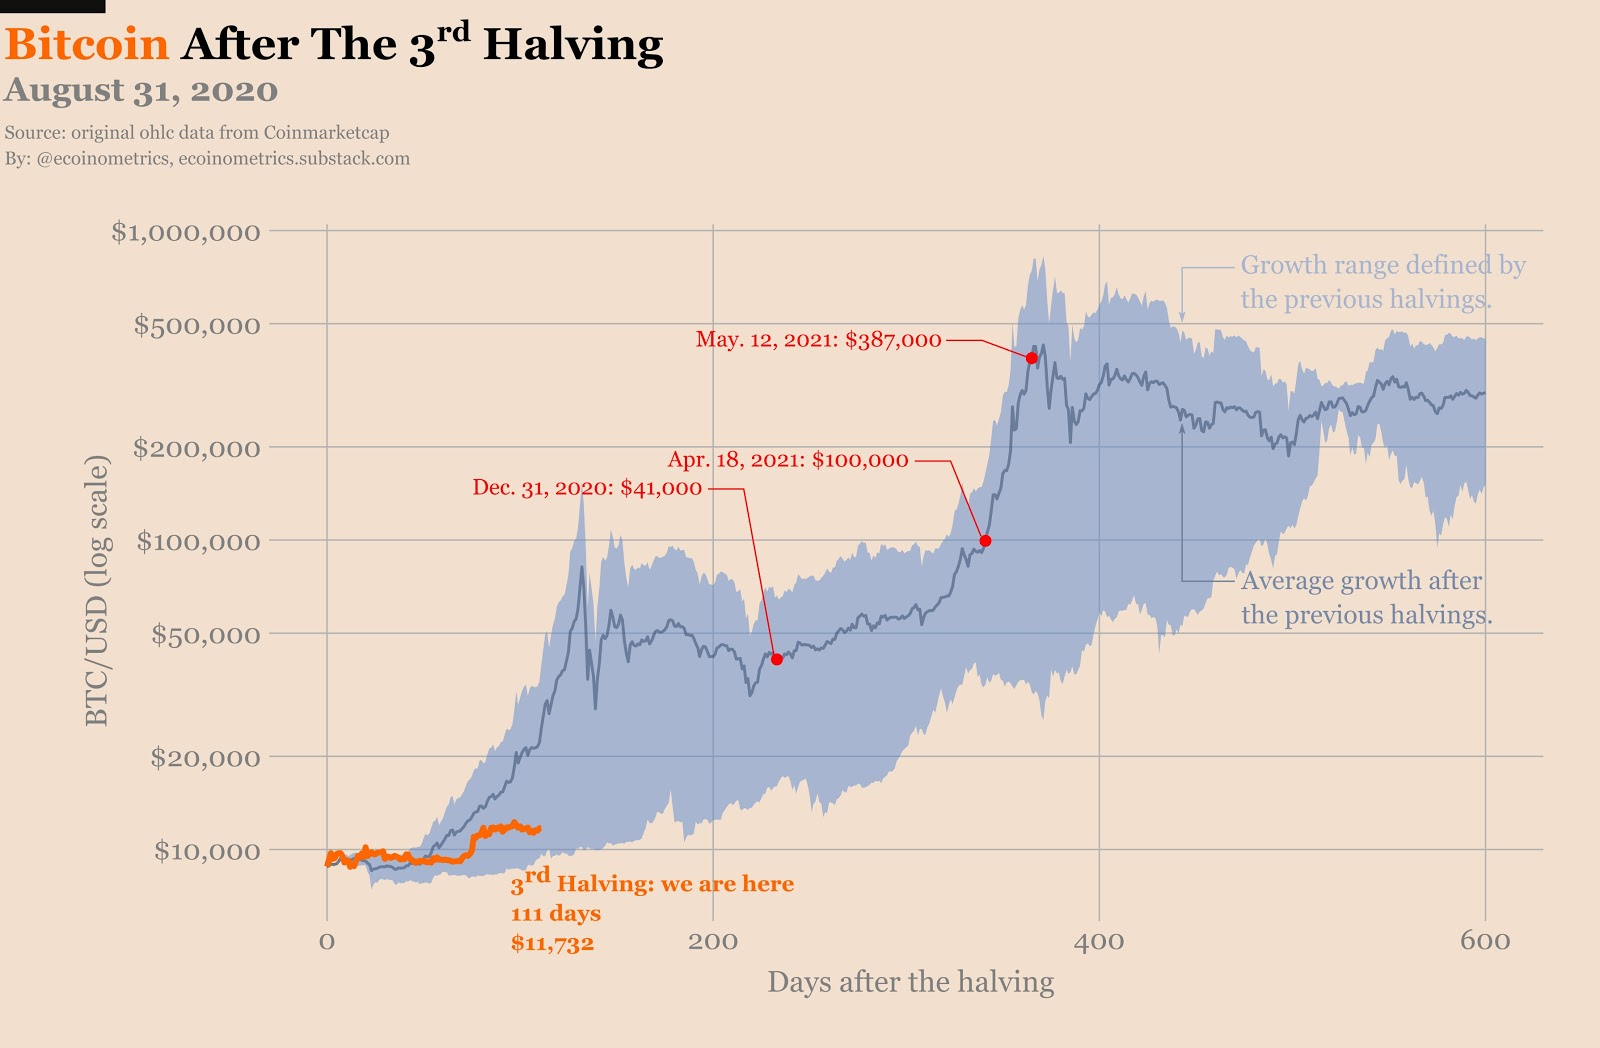 Bitcoin price forecast post 2020 halving